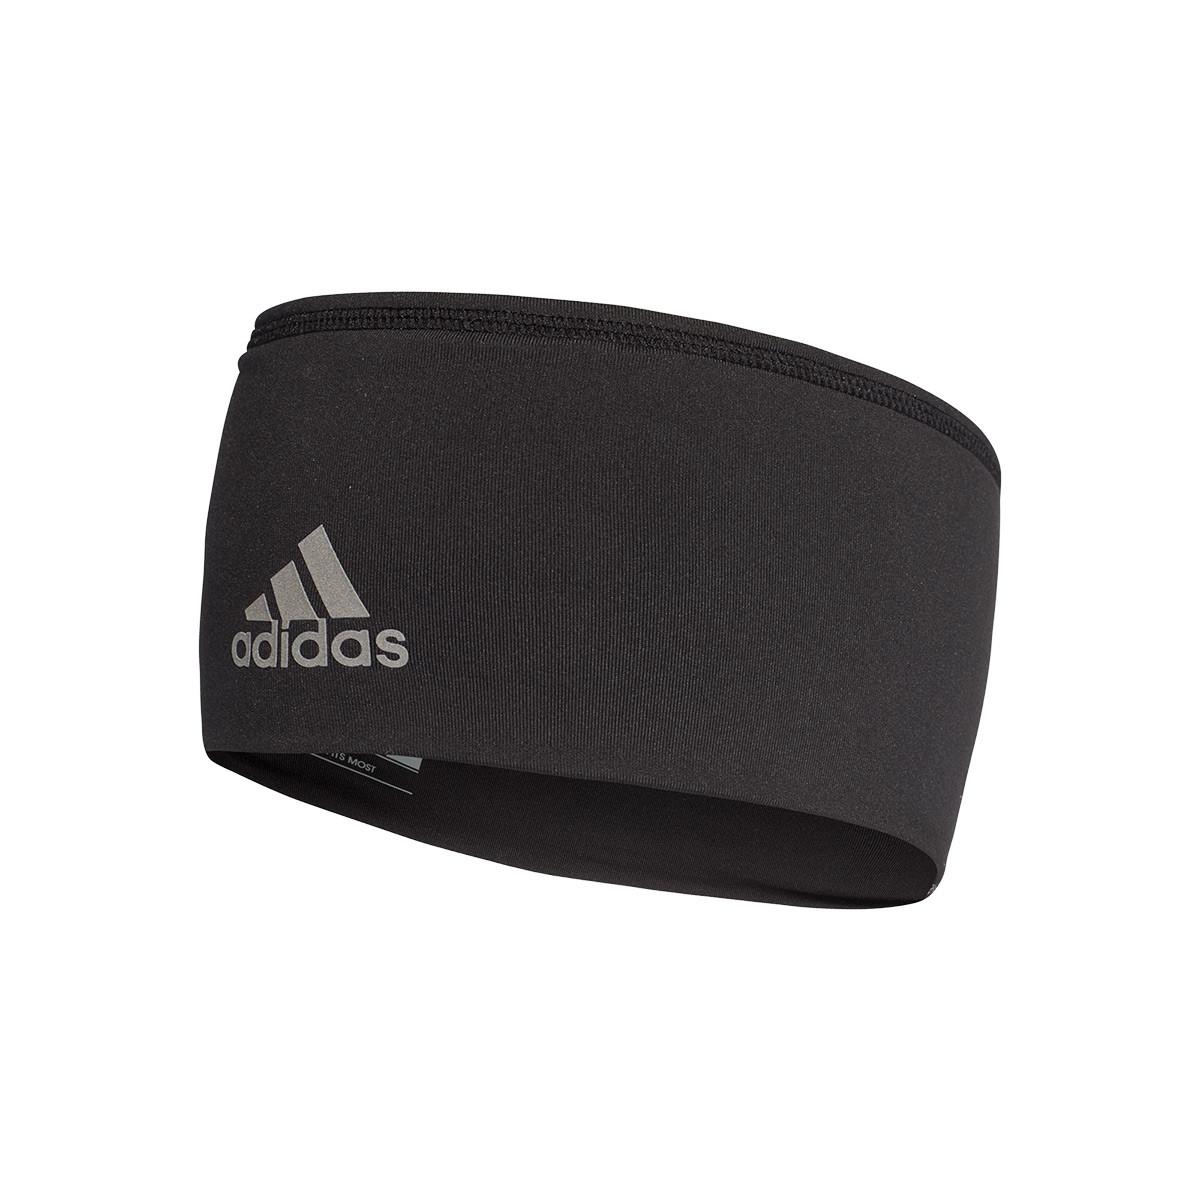 Fita adidas Headband Wide Black-Reflective silver - Loja de futebol Fútbol Emotion